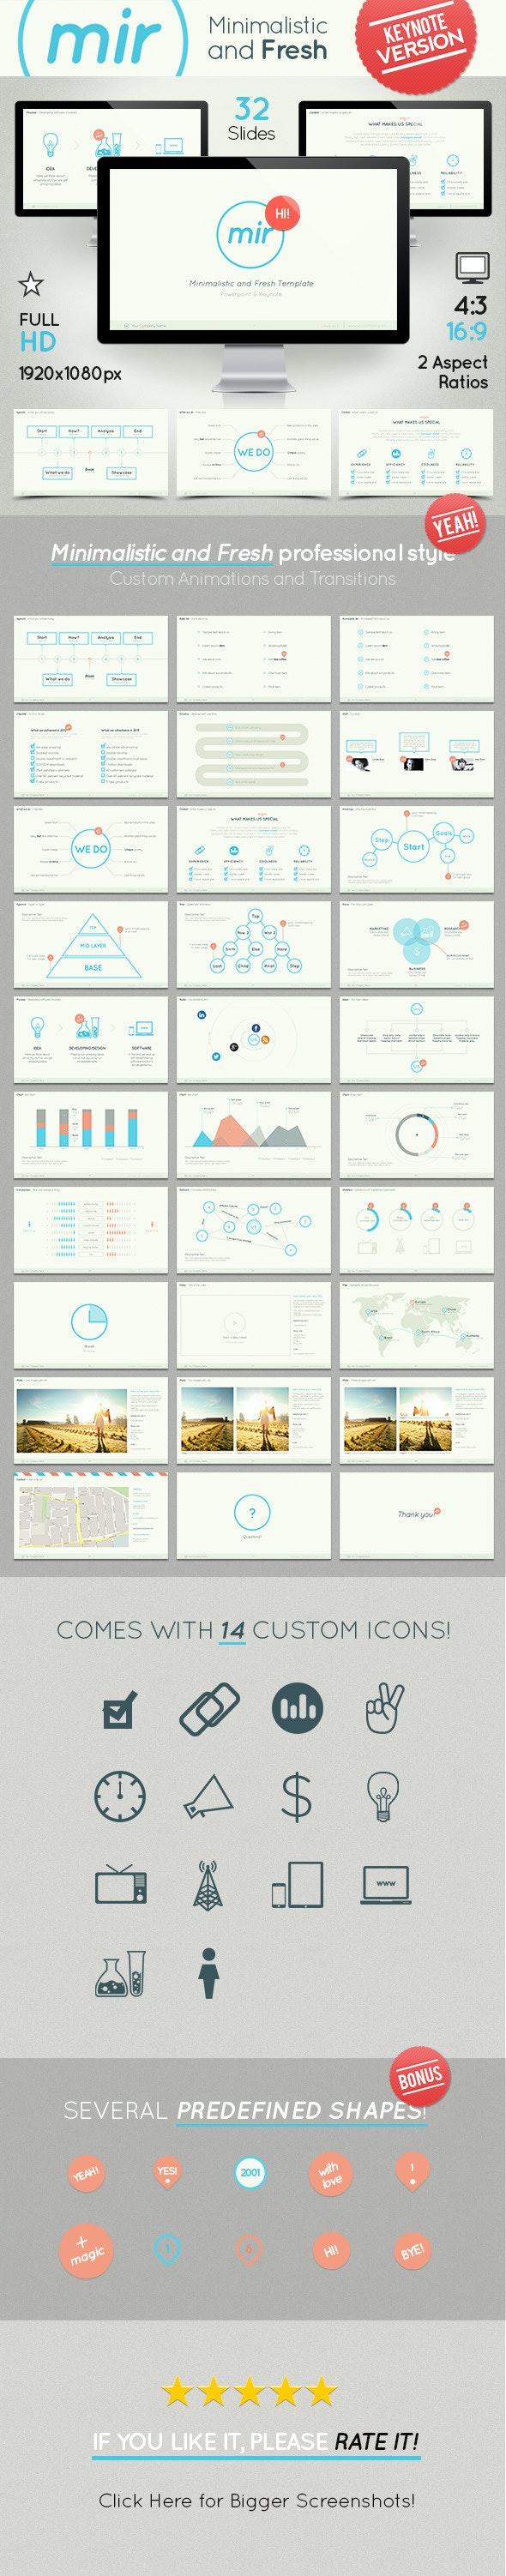 Mir- Minimalistic and Fresh Keynote Template - Keynote Templates Presentation Templates